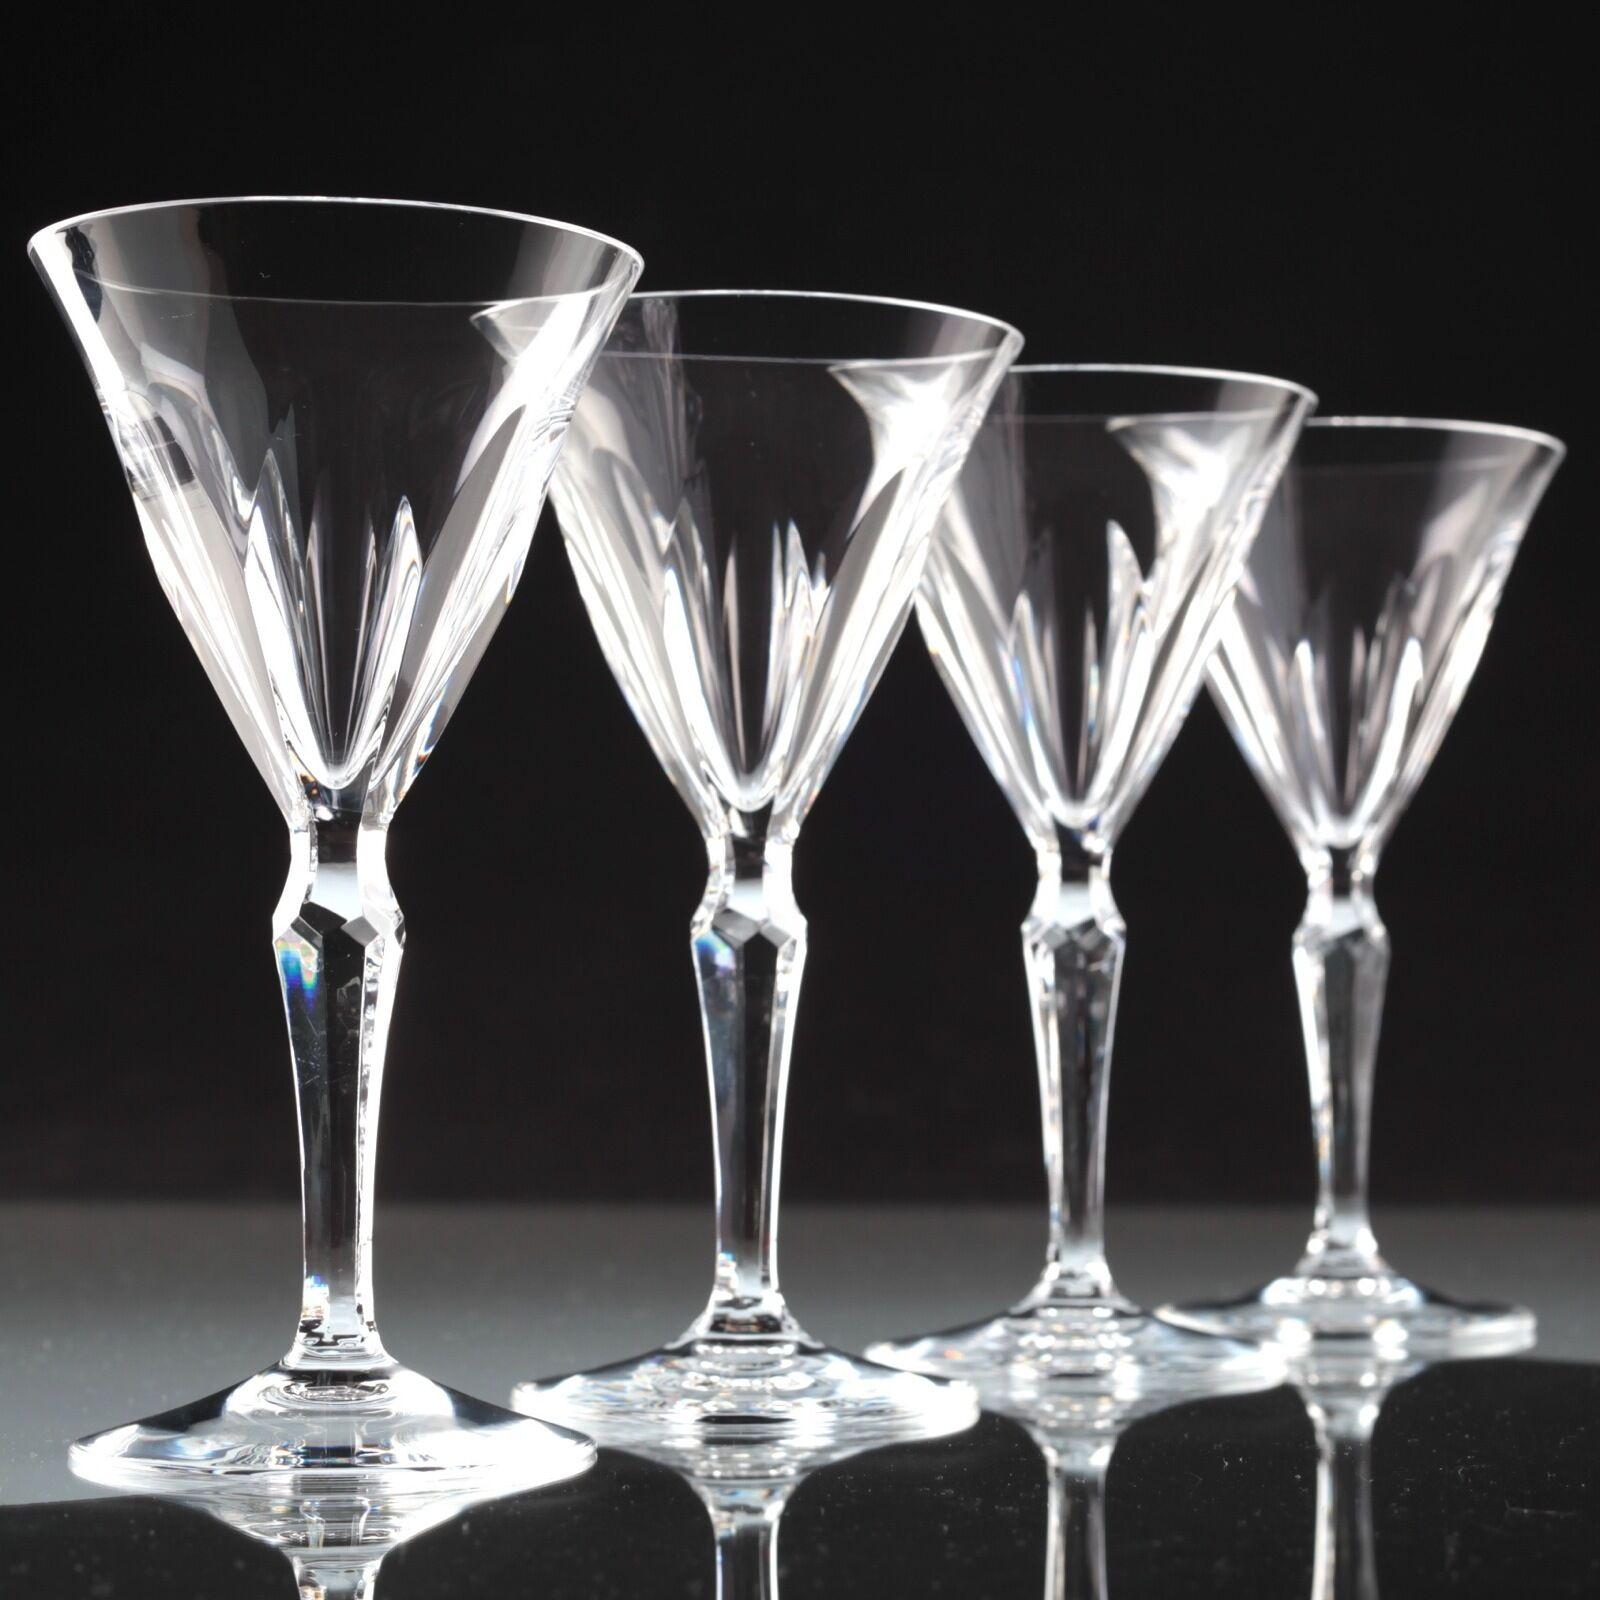 4 Vintage Peill Kristall Weißgläser WeißWeißgläser Gläser klar U4U